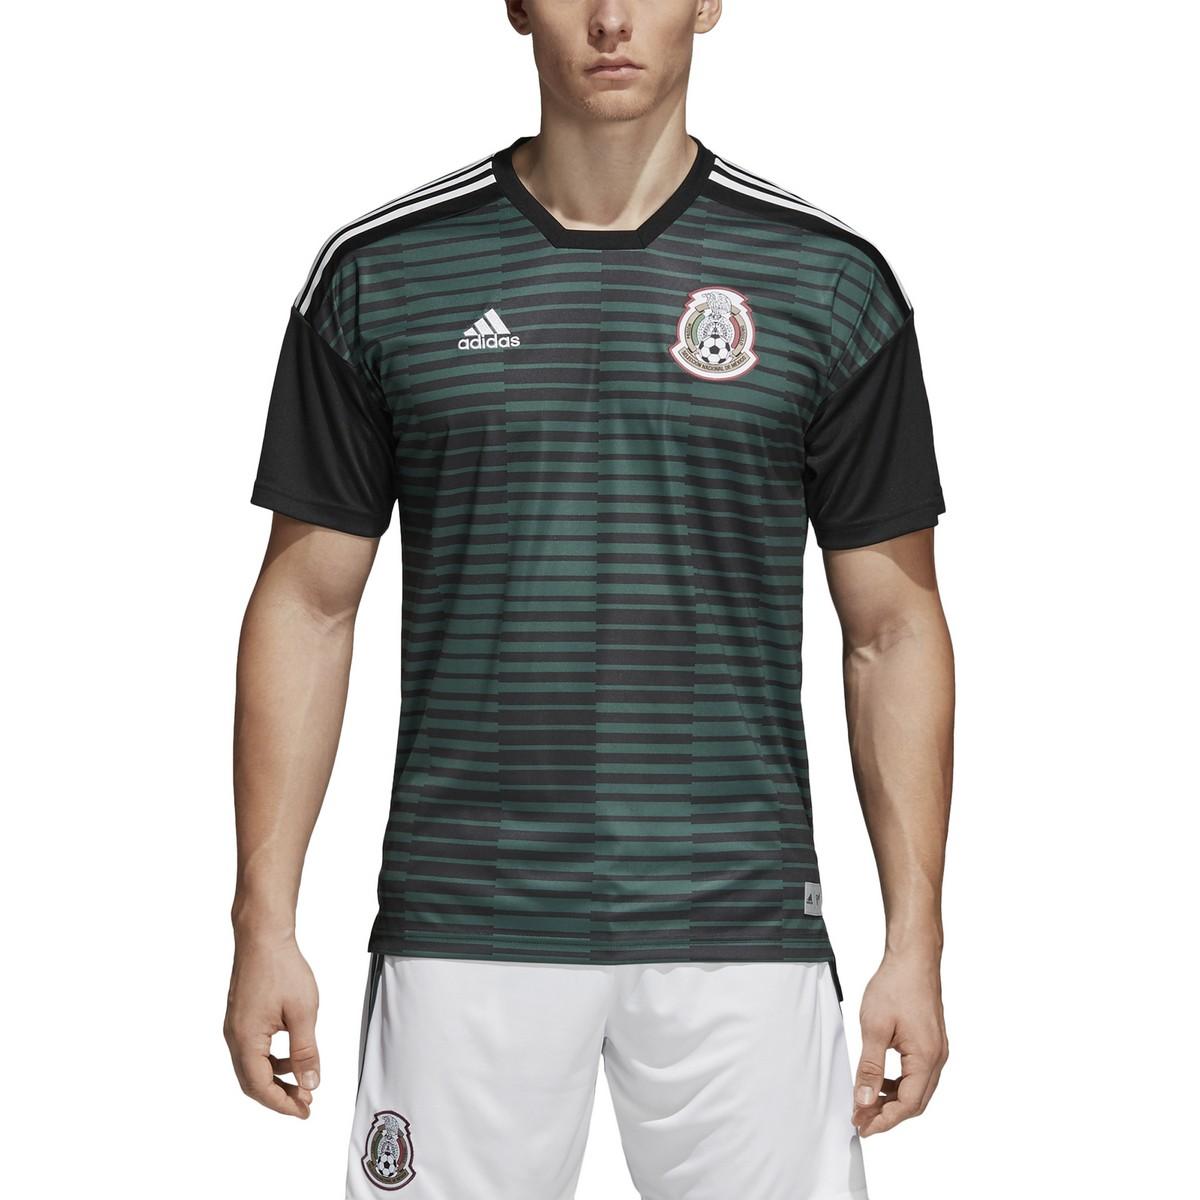 Mexico FMF jersey pre match green 2018/19 Adidas